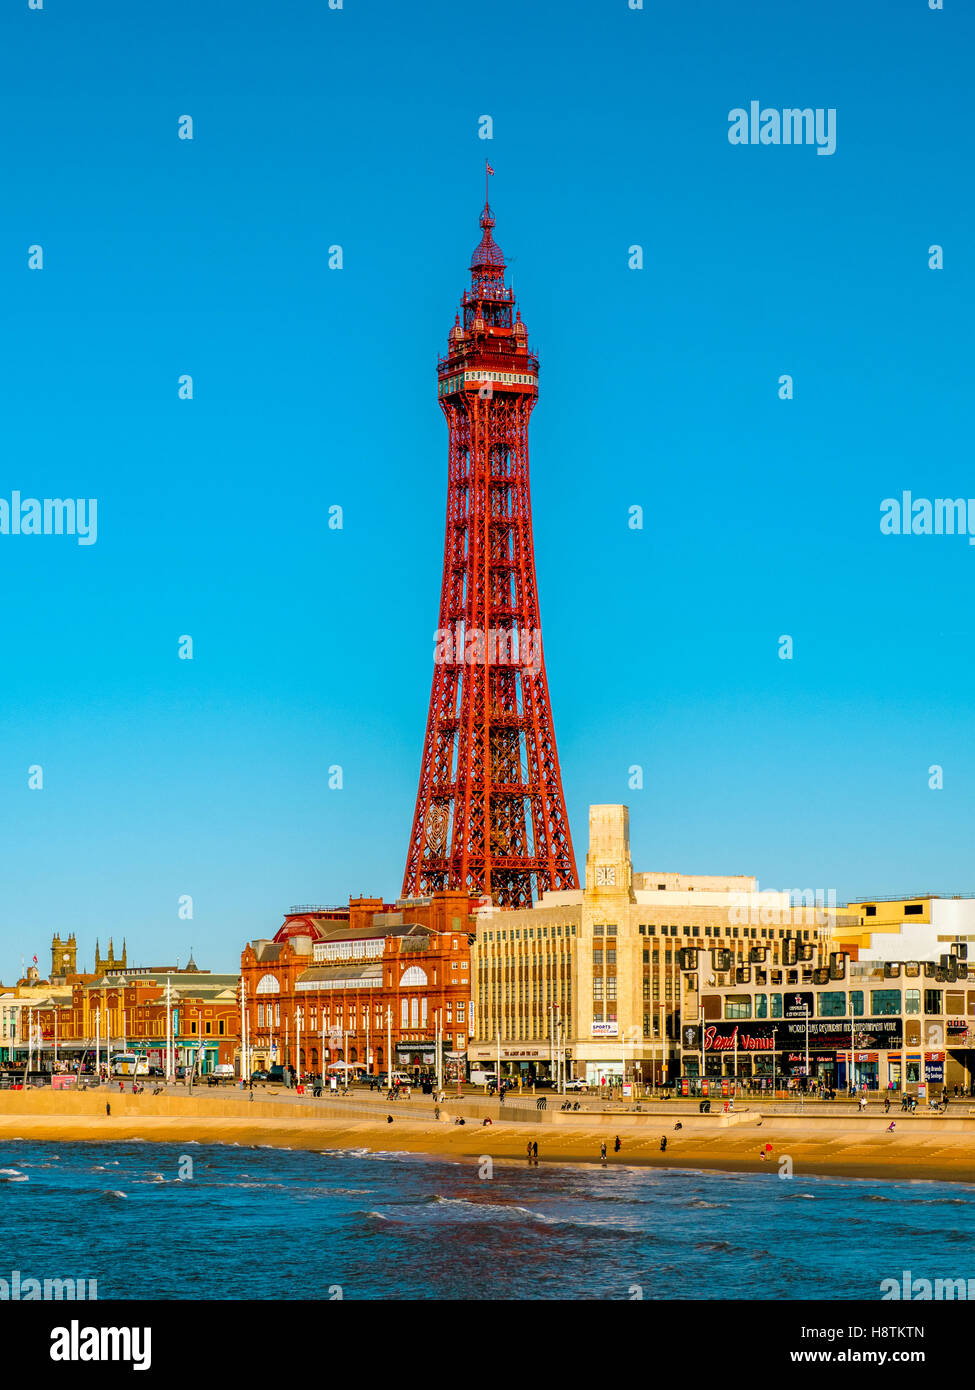 La tour de Blackpool et de la Promenade, Blackpool, Lancashire, Royaume-Uni. Photo Stock